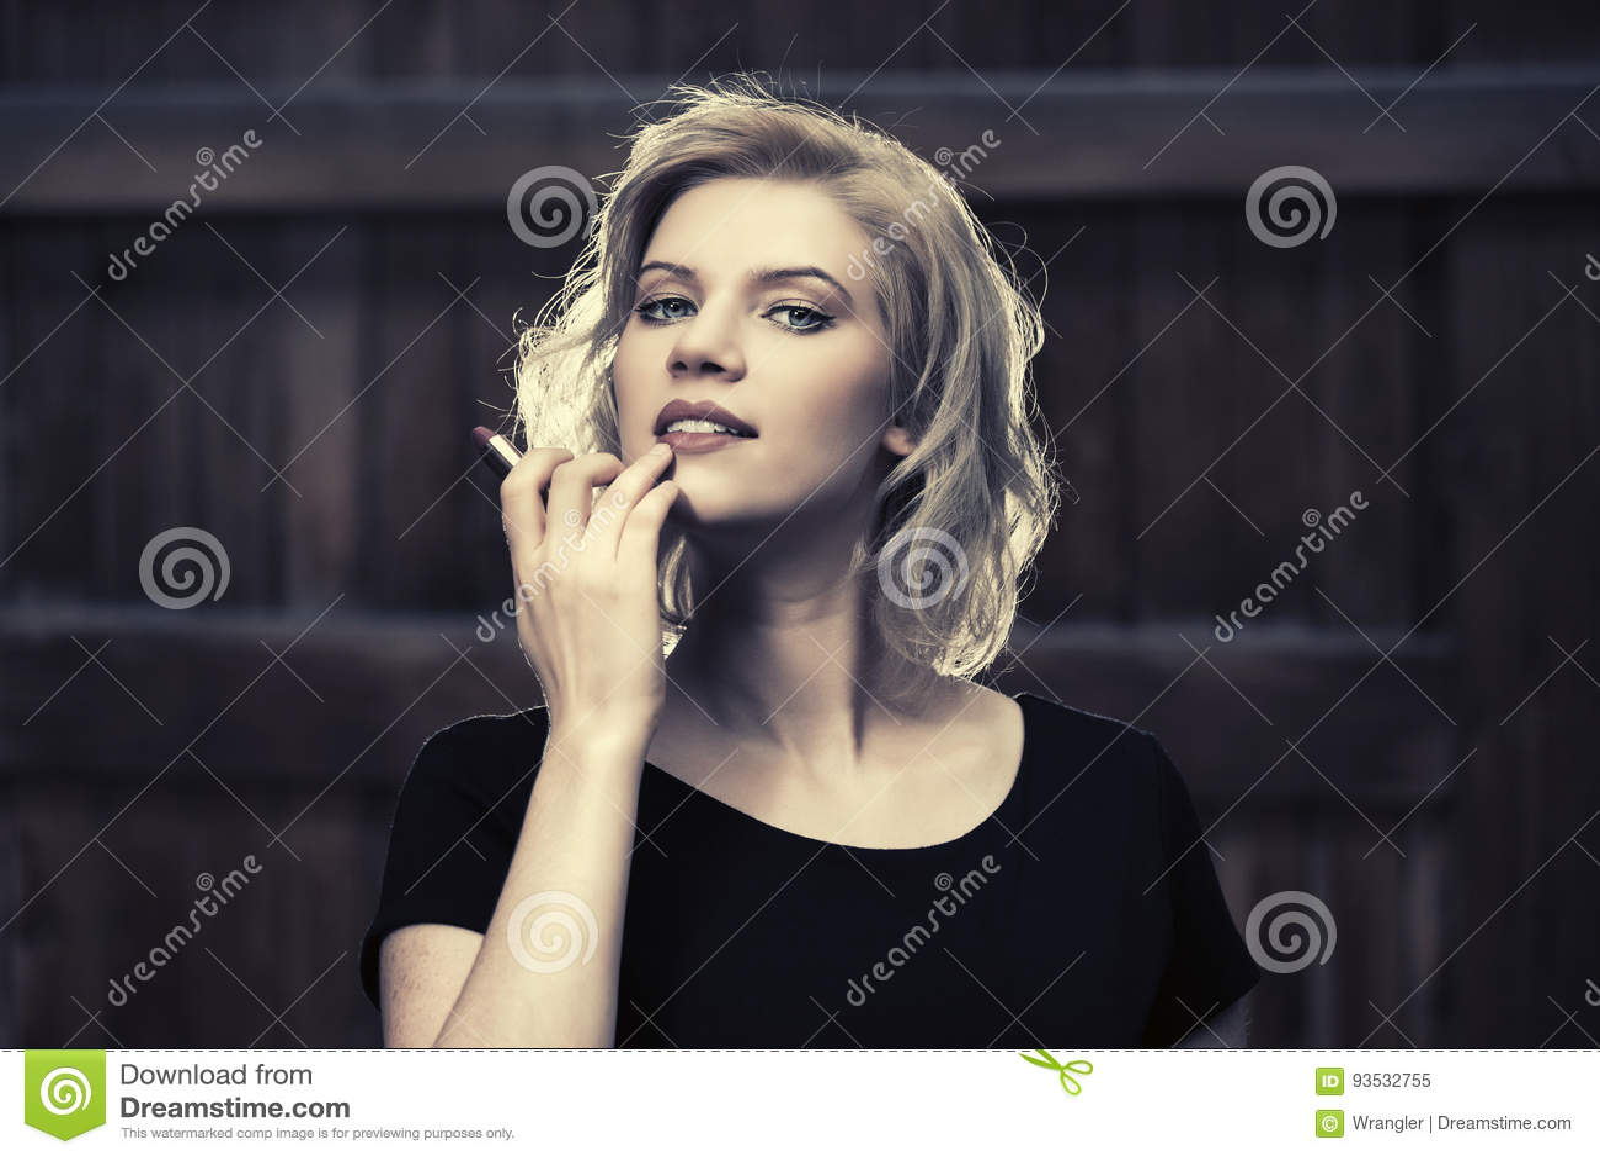 Black dress lipstick - Happy Young Fashion Woman In Black Dress Holding A Lipstick